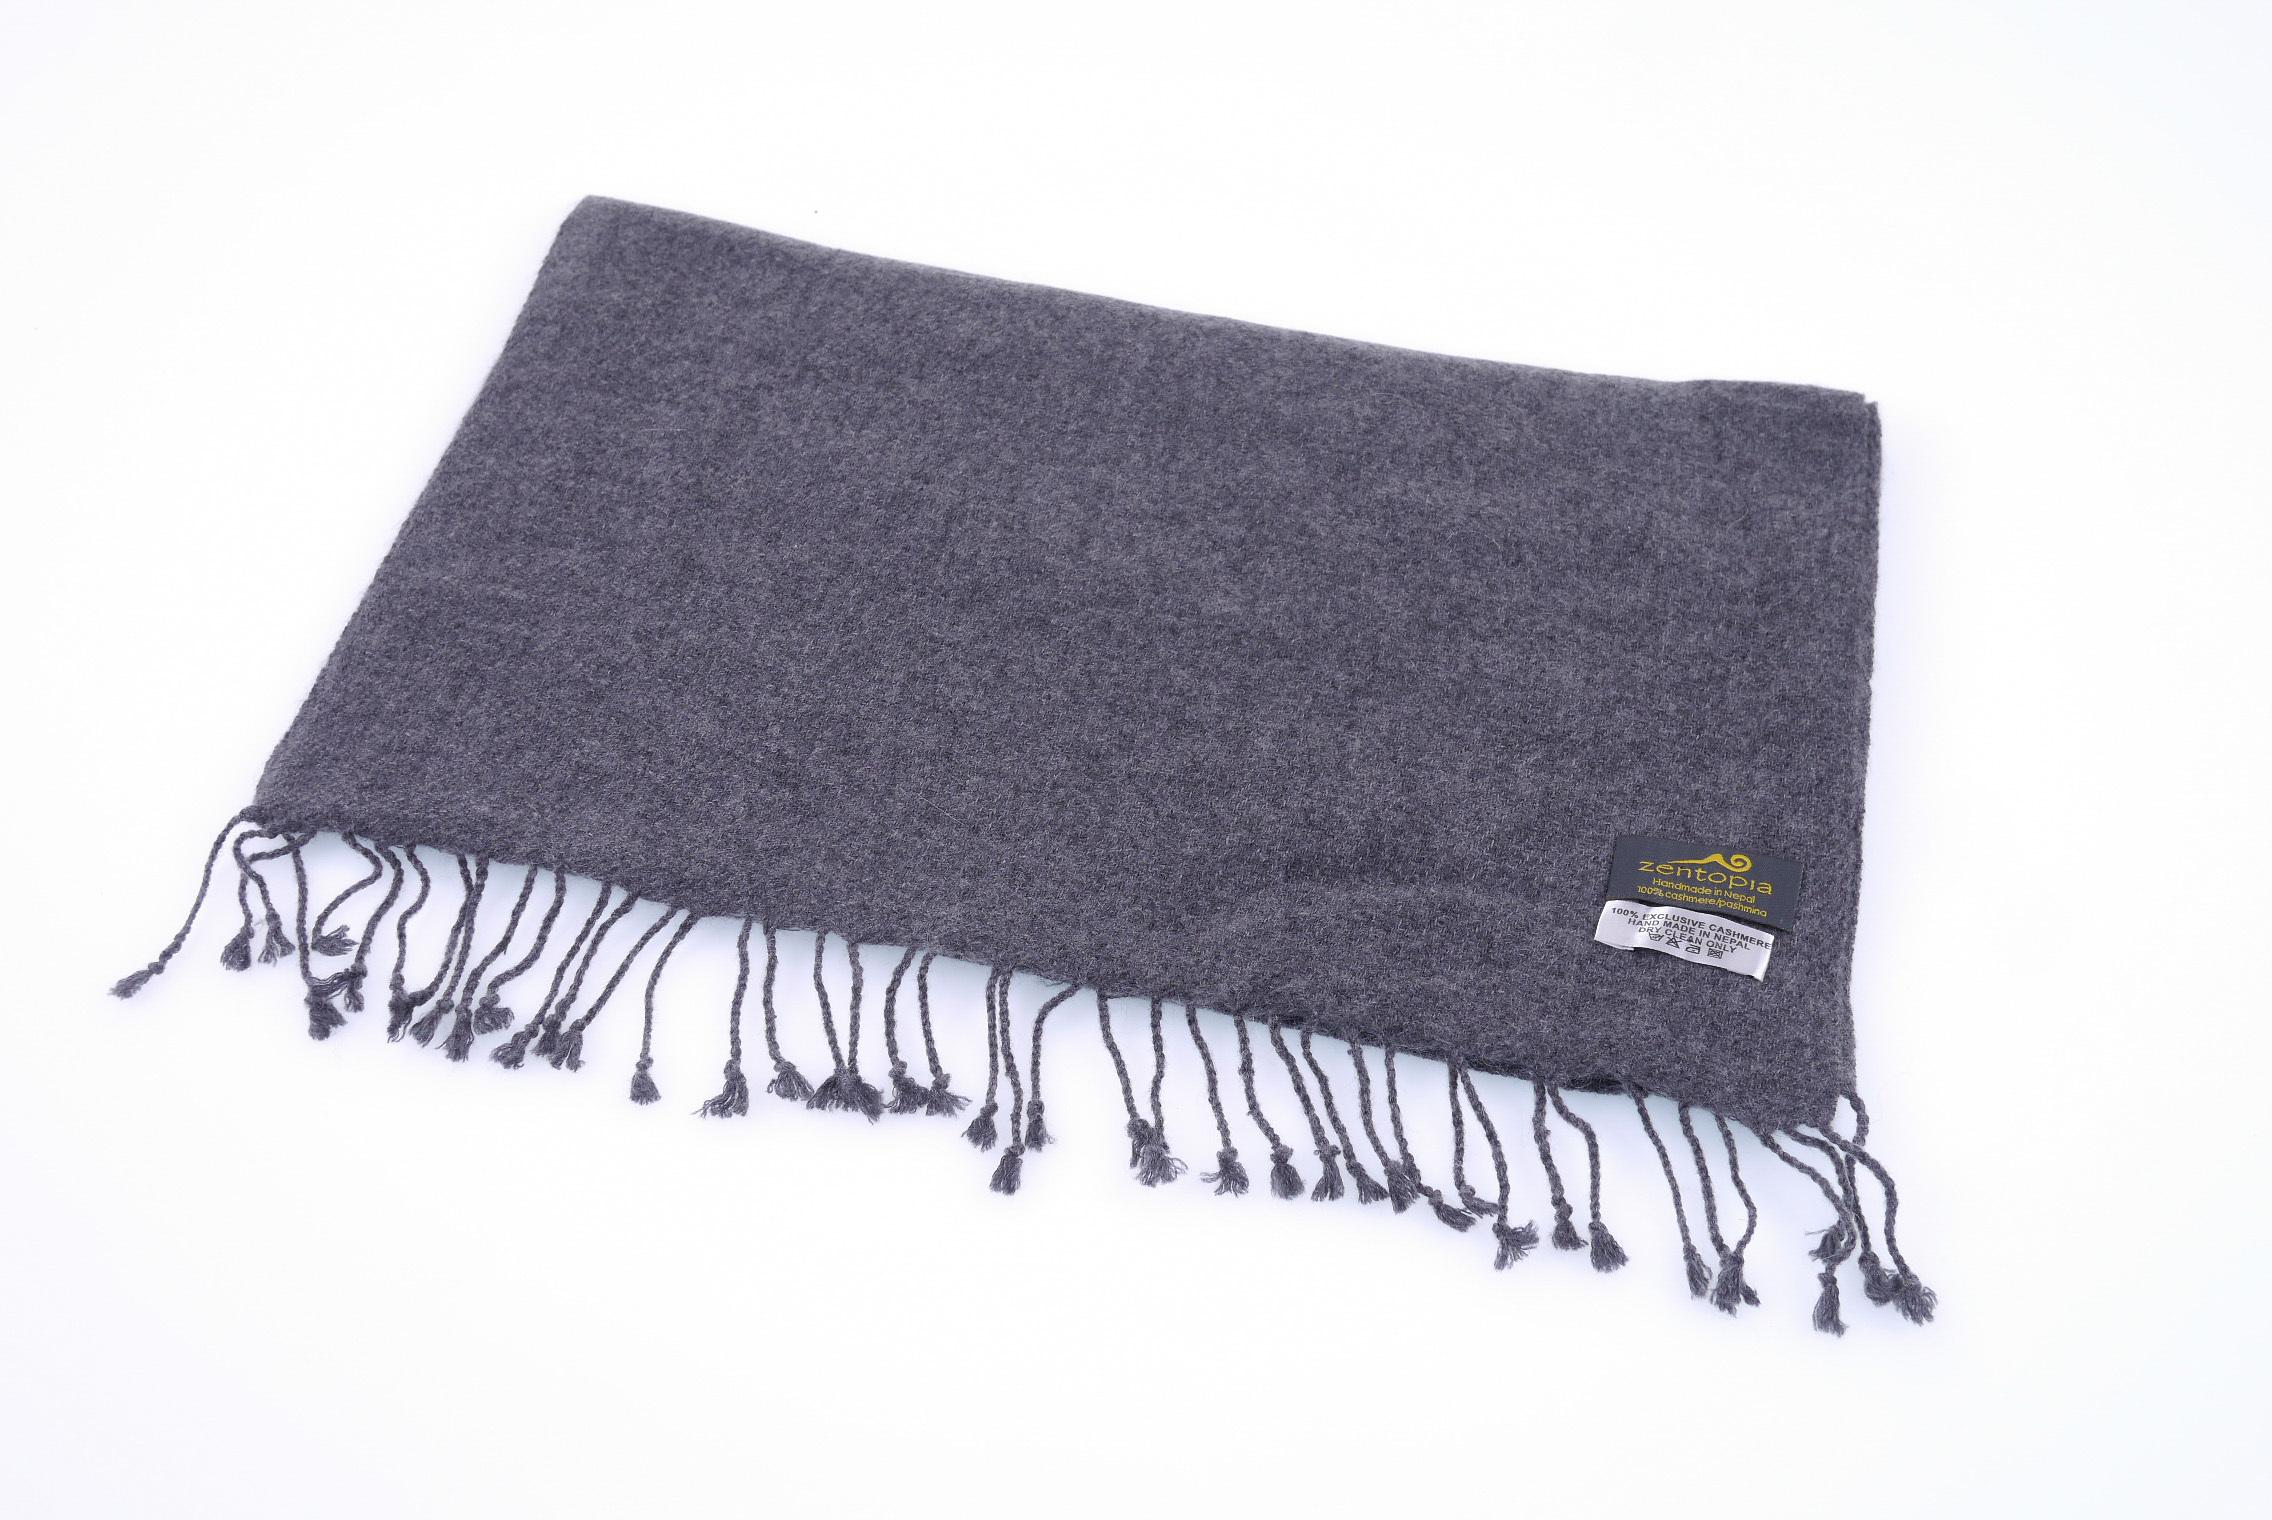 zentopia經典100%喀什米爾圍巾原色窄版BQCASF1236-2.jpg